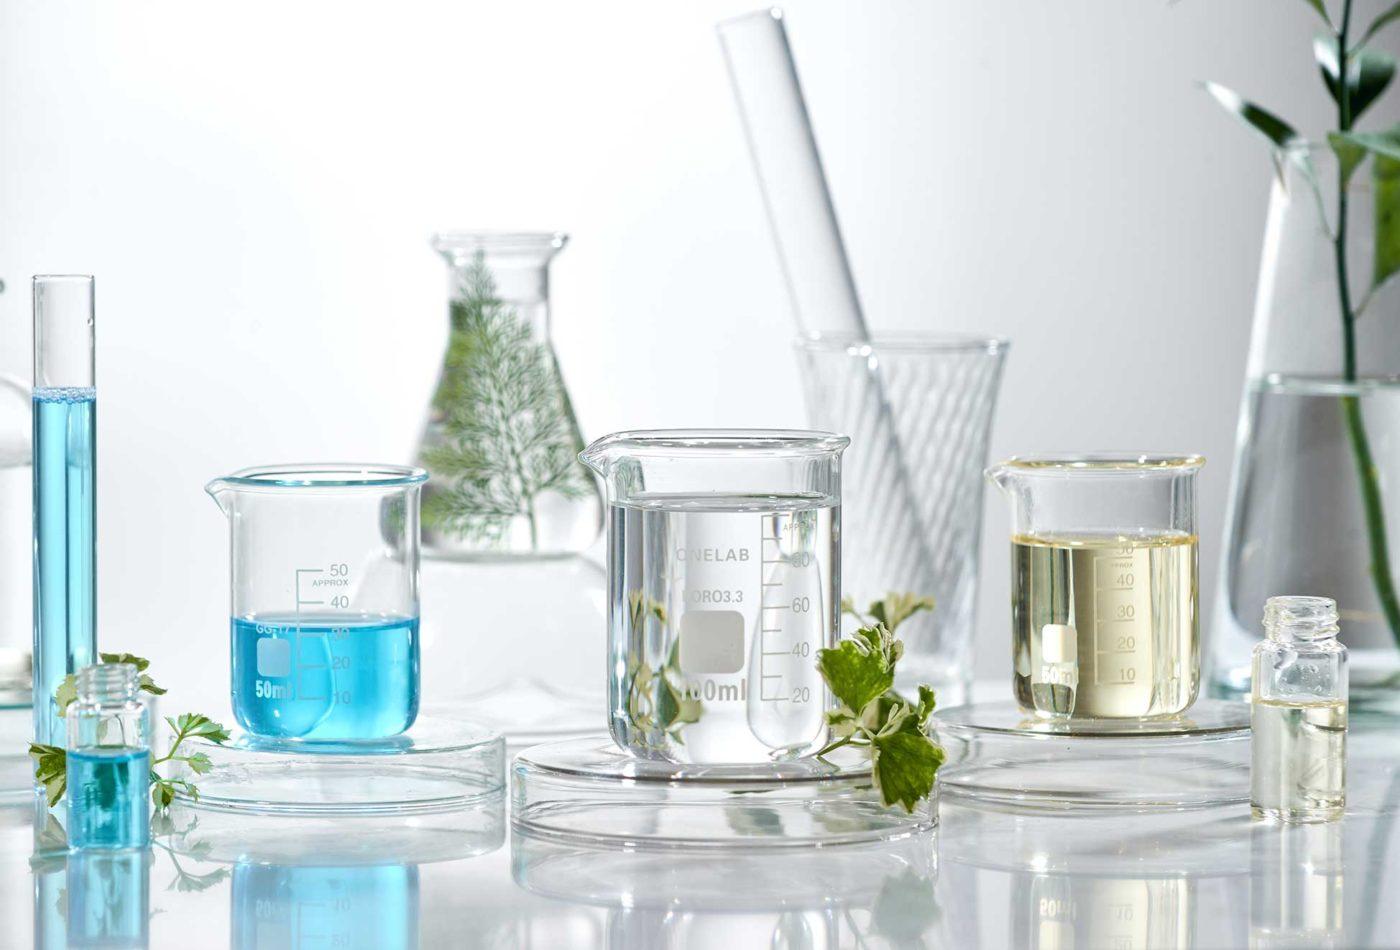 New laboratory